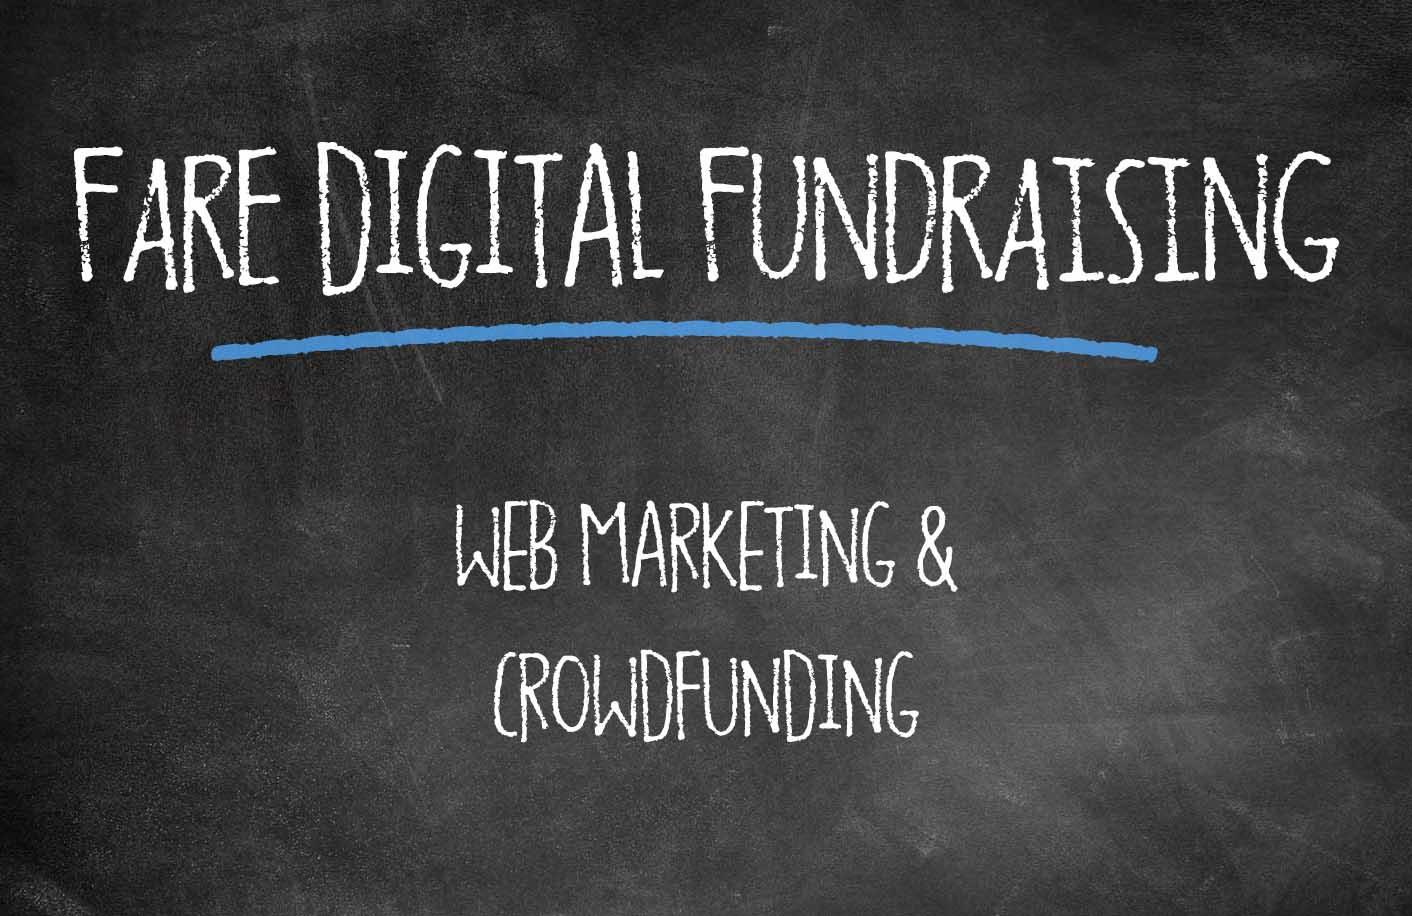 FARE DIGITAL FUNDRAISING: web marketing & crowdfunding